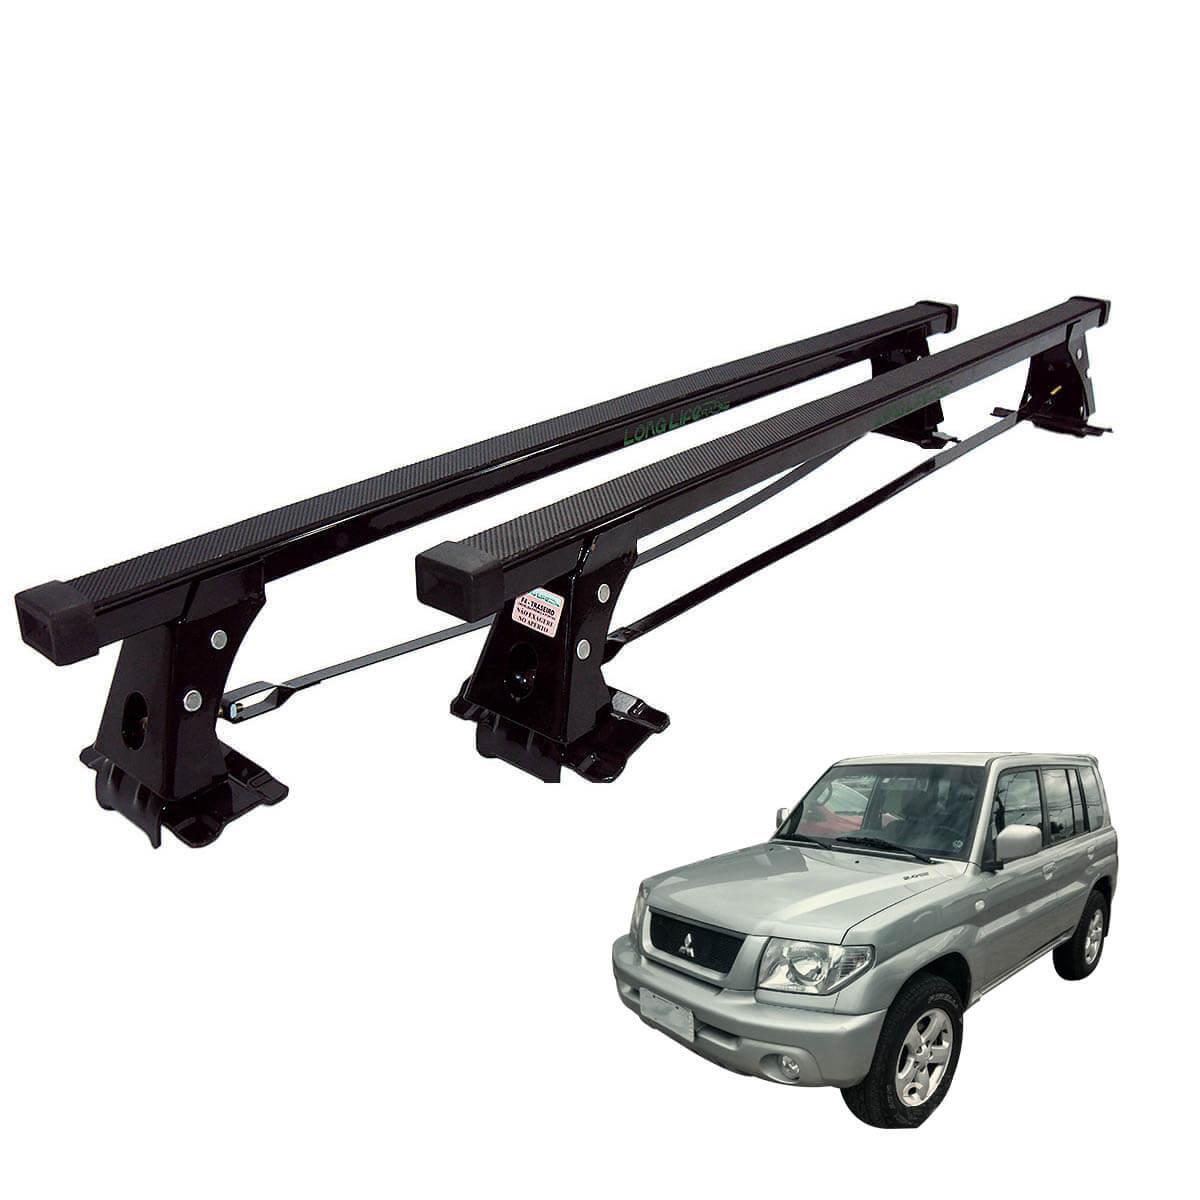 Rack de teto Long Life Aço Pajero TR4 2003 a 2015 ou Pajero IO 1999 a 2002 sem longarina de teto